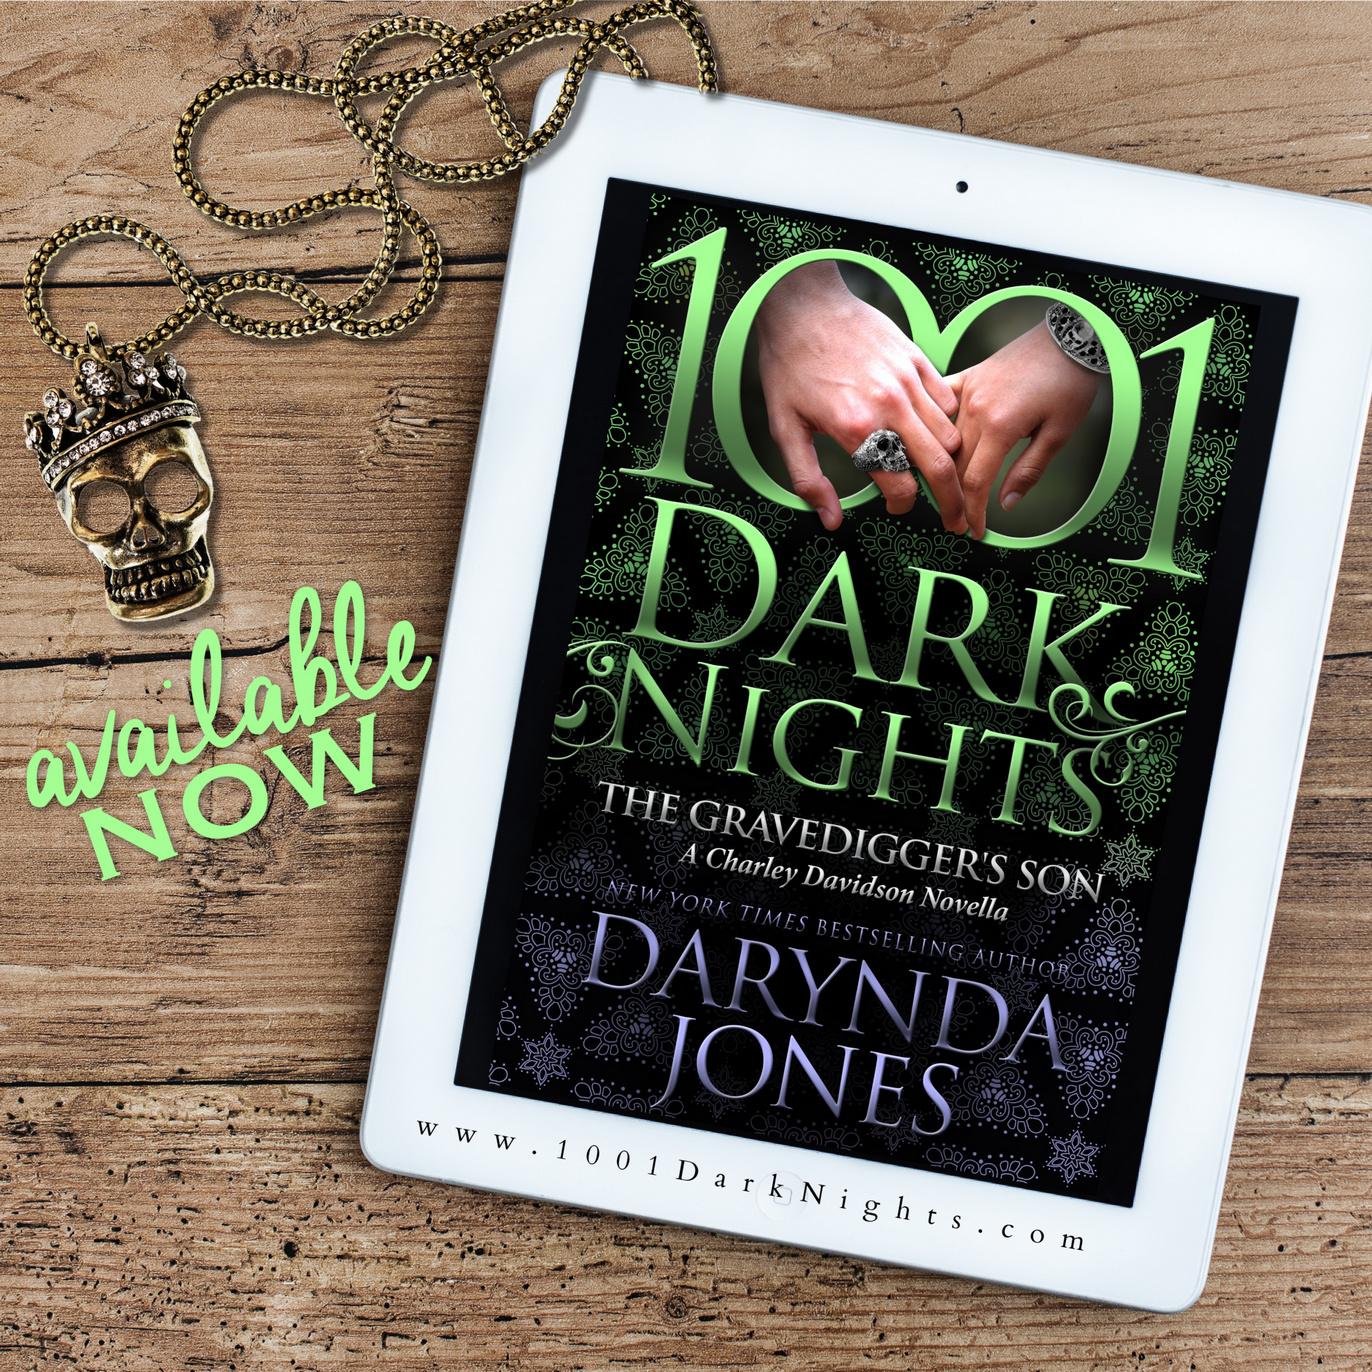 🎧 The Gravedigger's Son by Darynda Jones